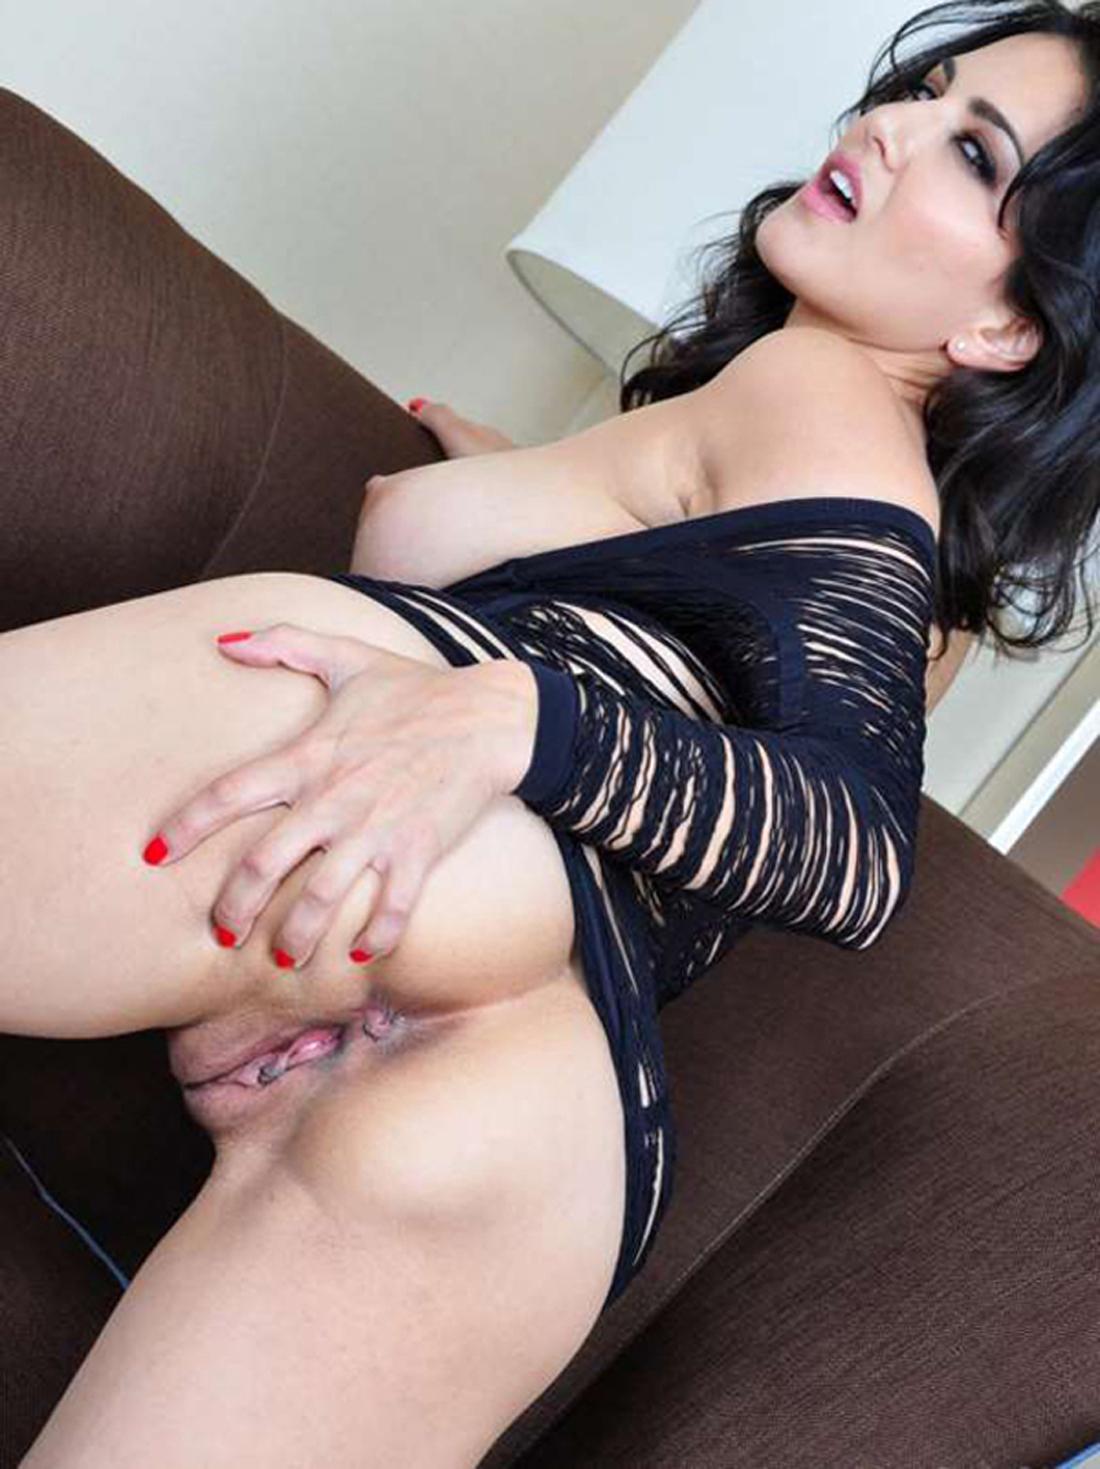 Sunny leone sexy anal fuck, mg midget brake master cylinder